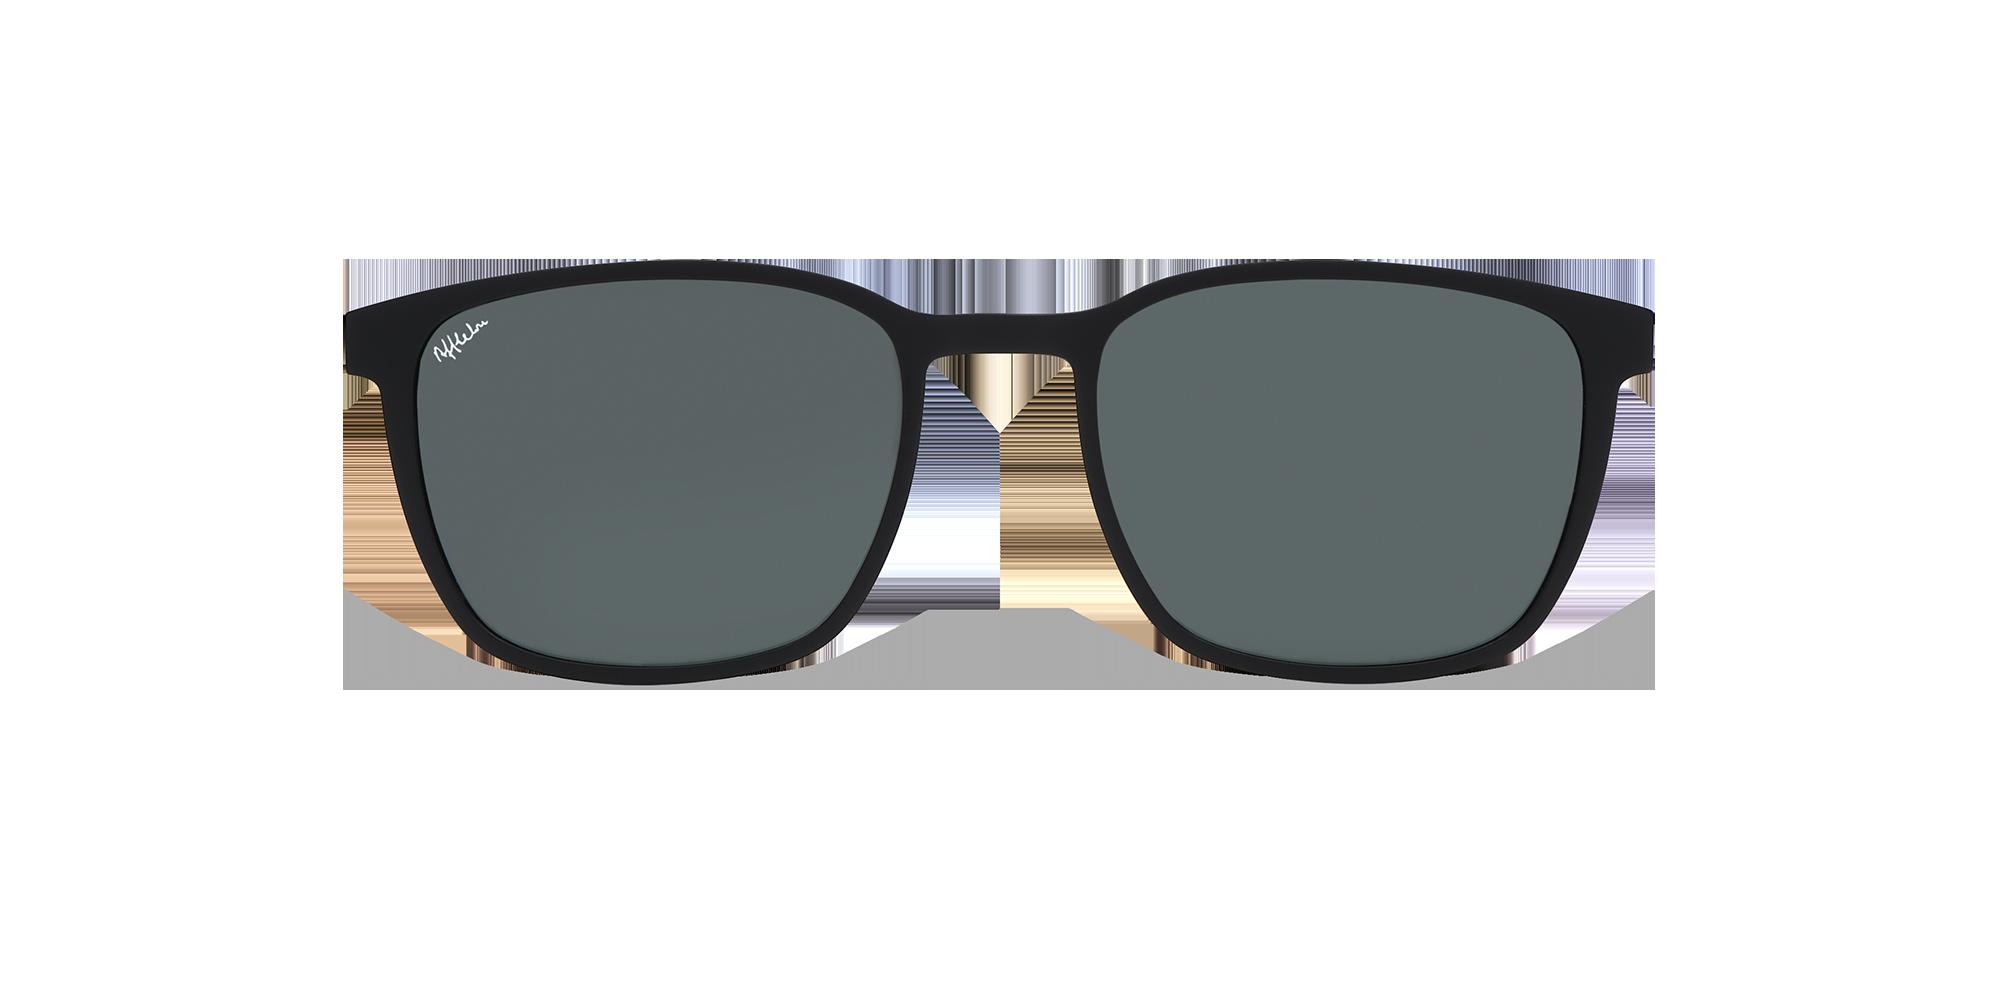 afflelou/france/products/smart_clip/clips_glasses/TMK42POBK015319.png